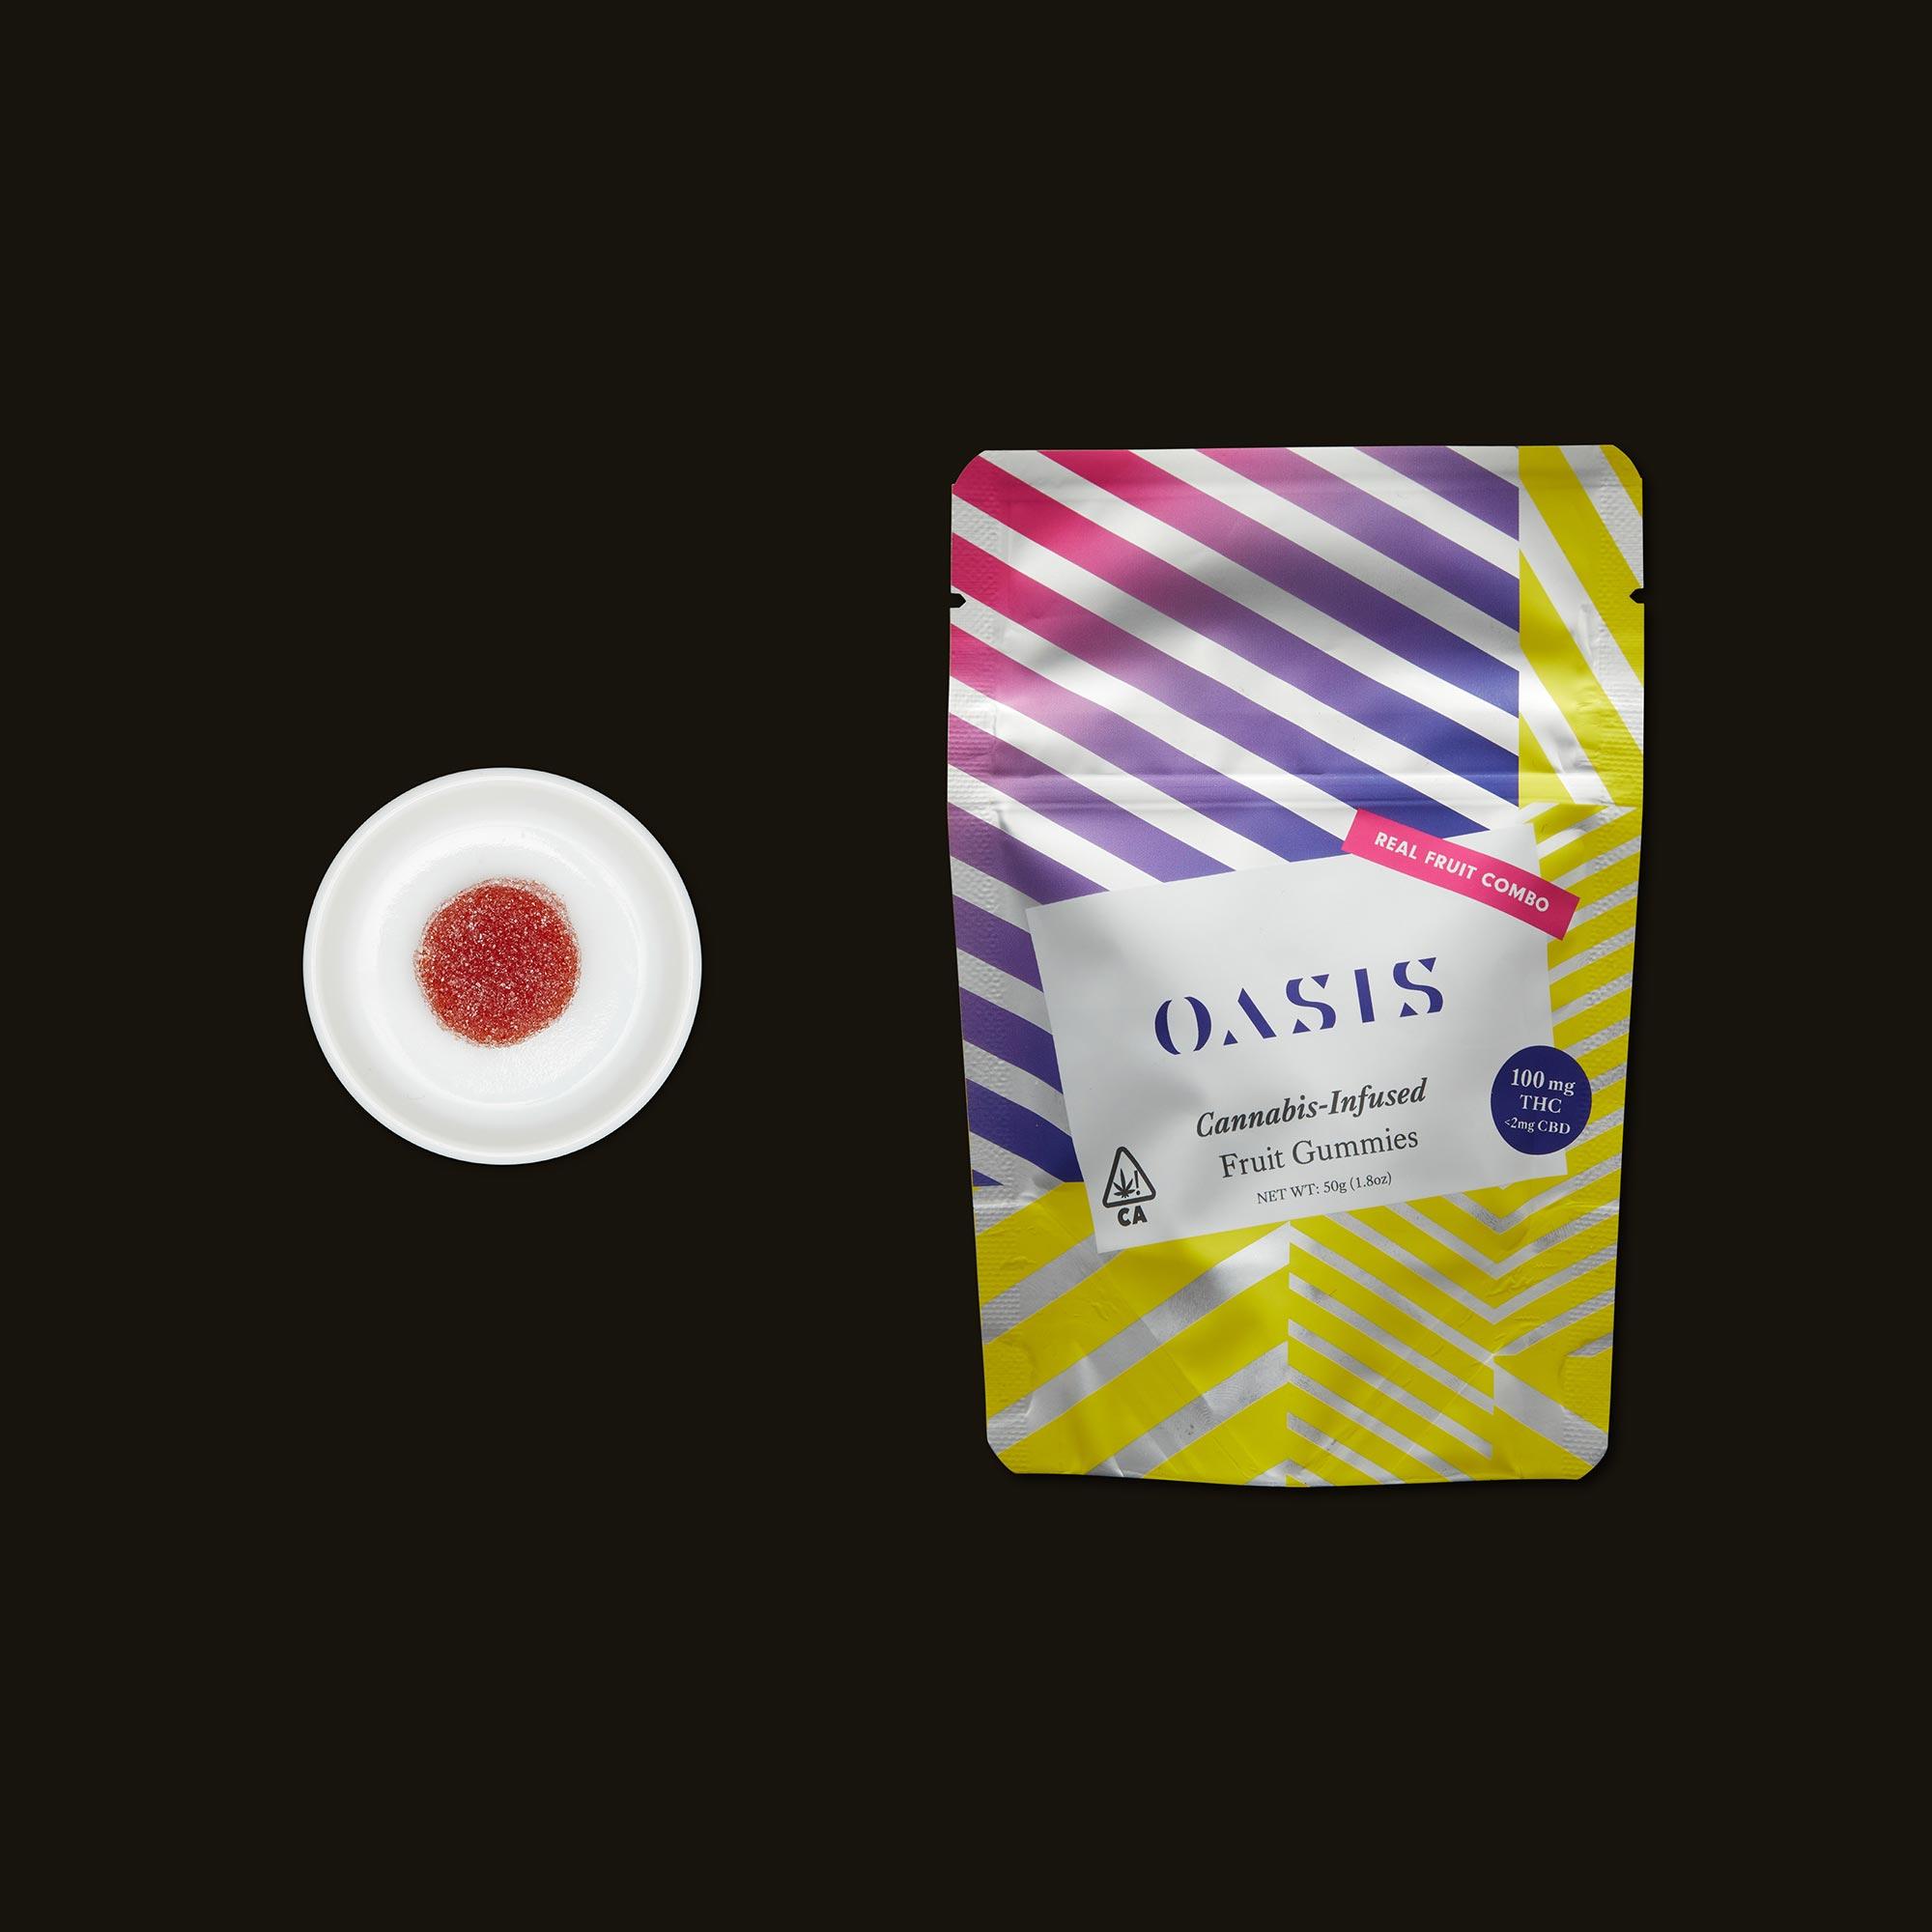 Oasis Fruit Gummies